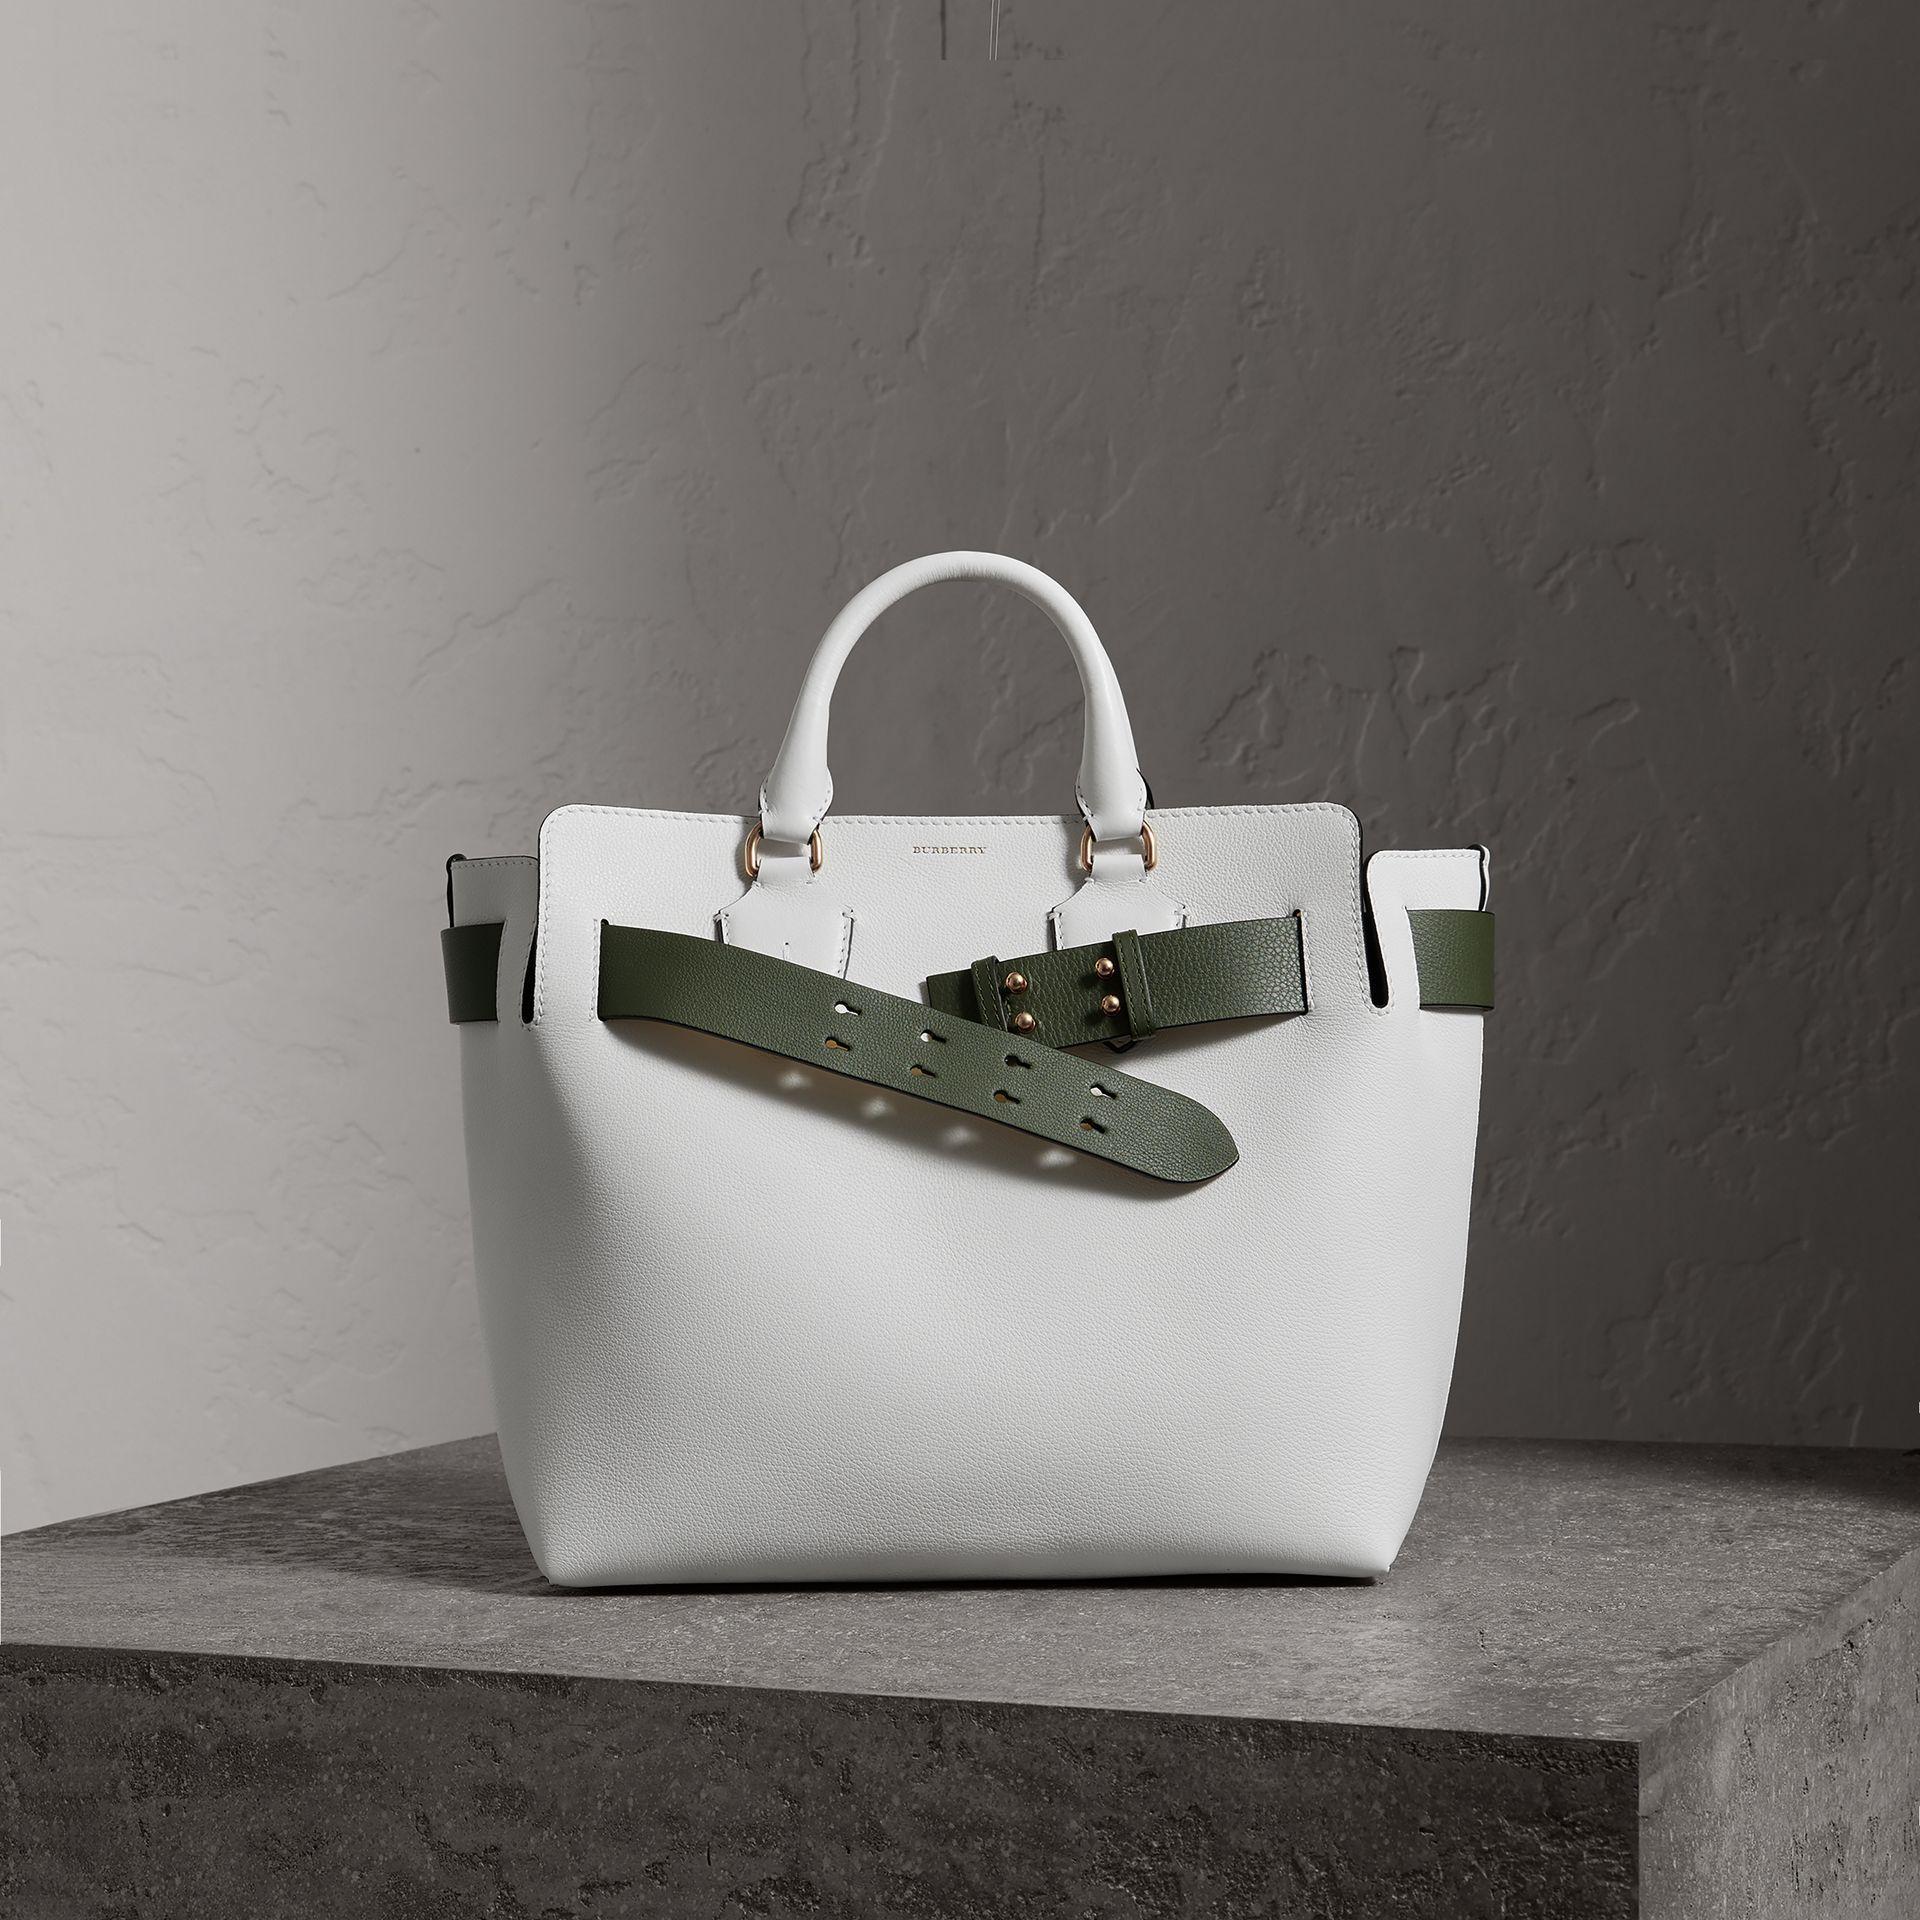 3eedae7862bc Burberry The Medium Leather Belt Bag In Chalk White